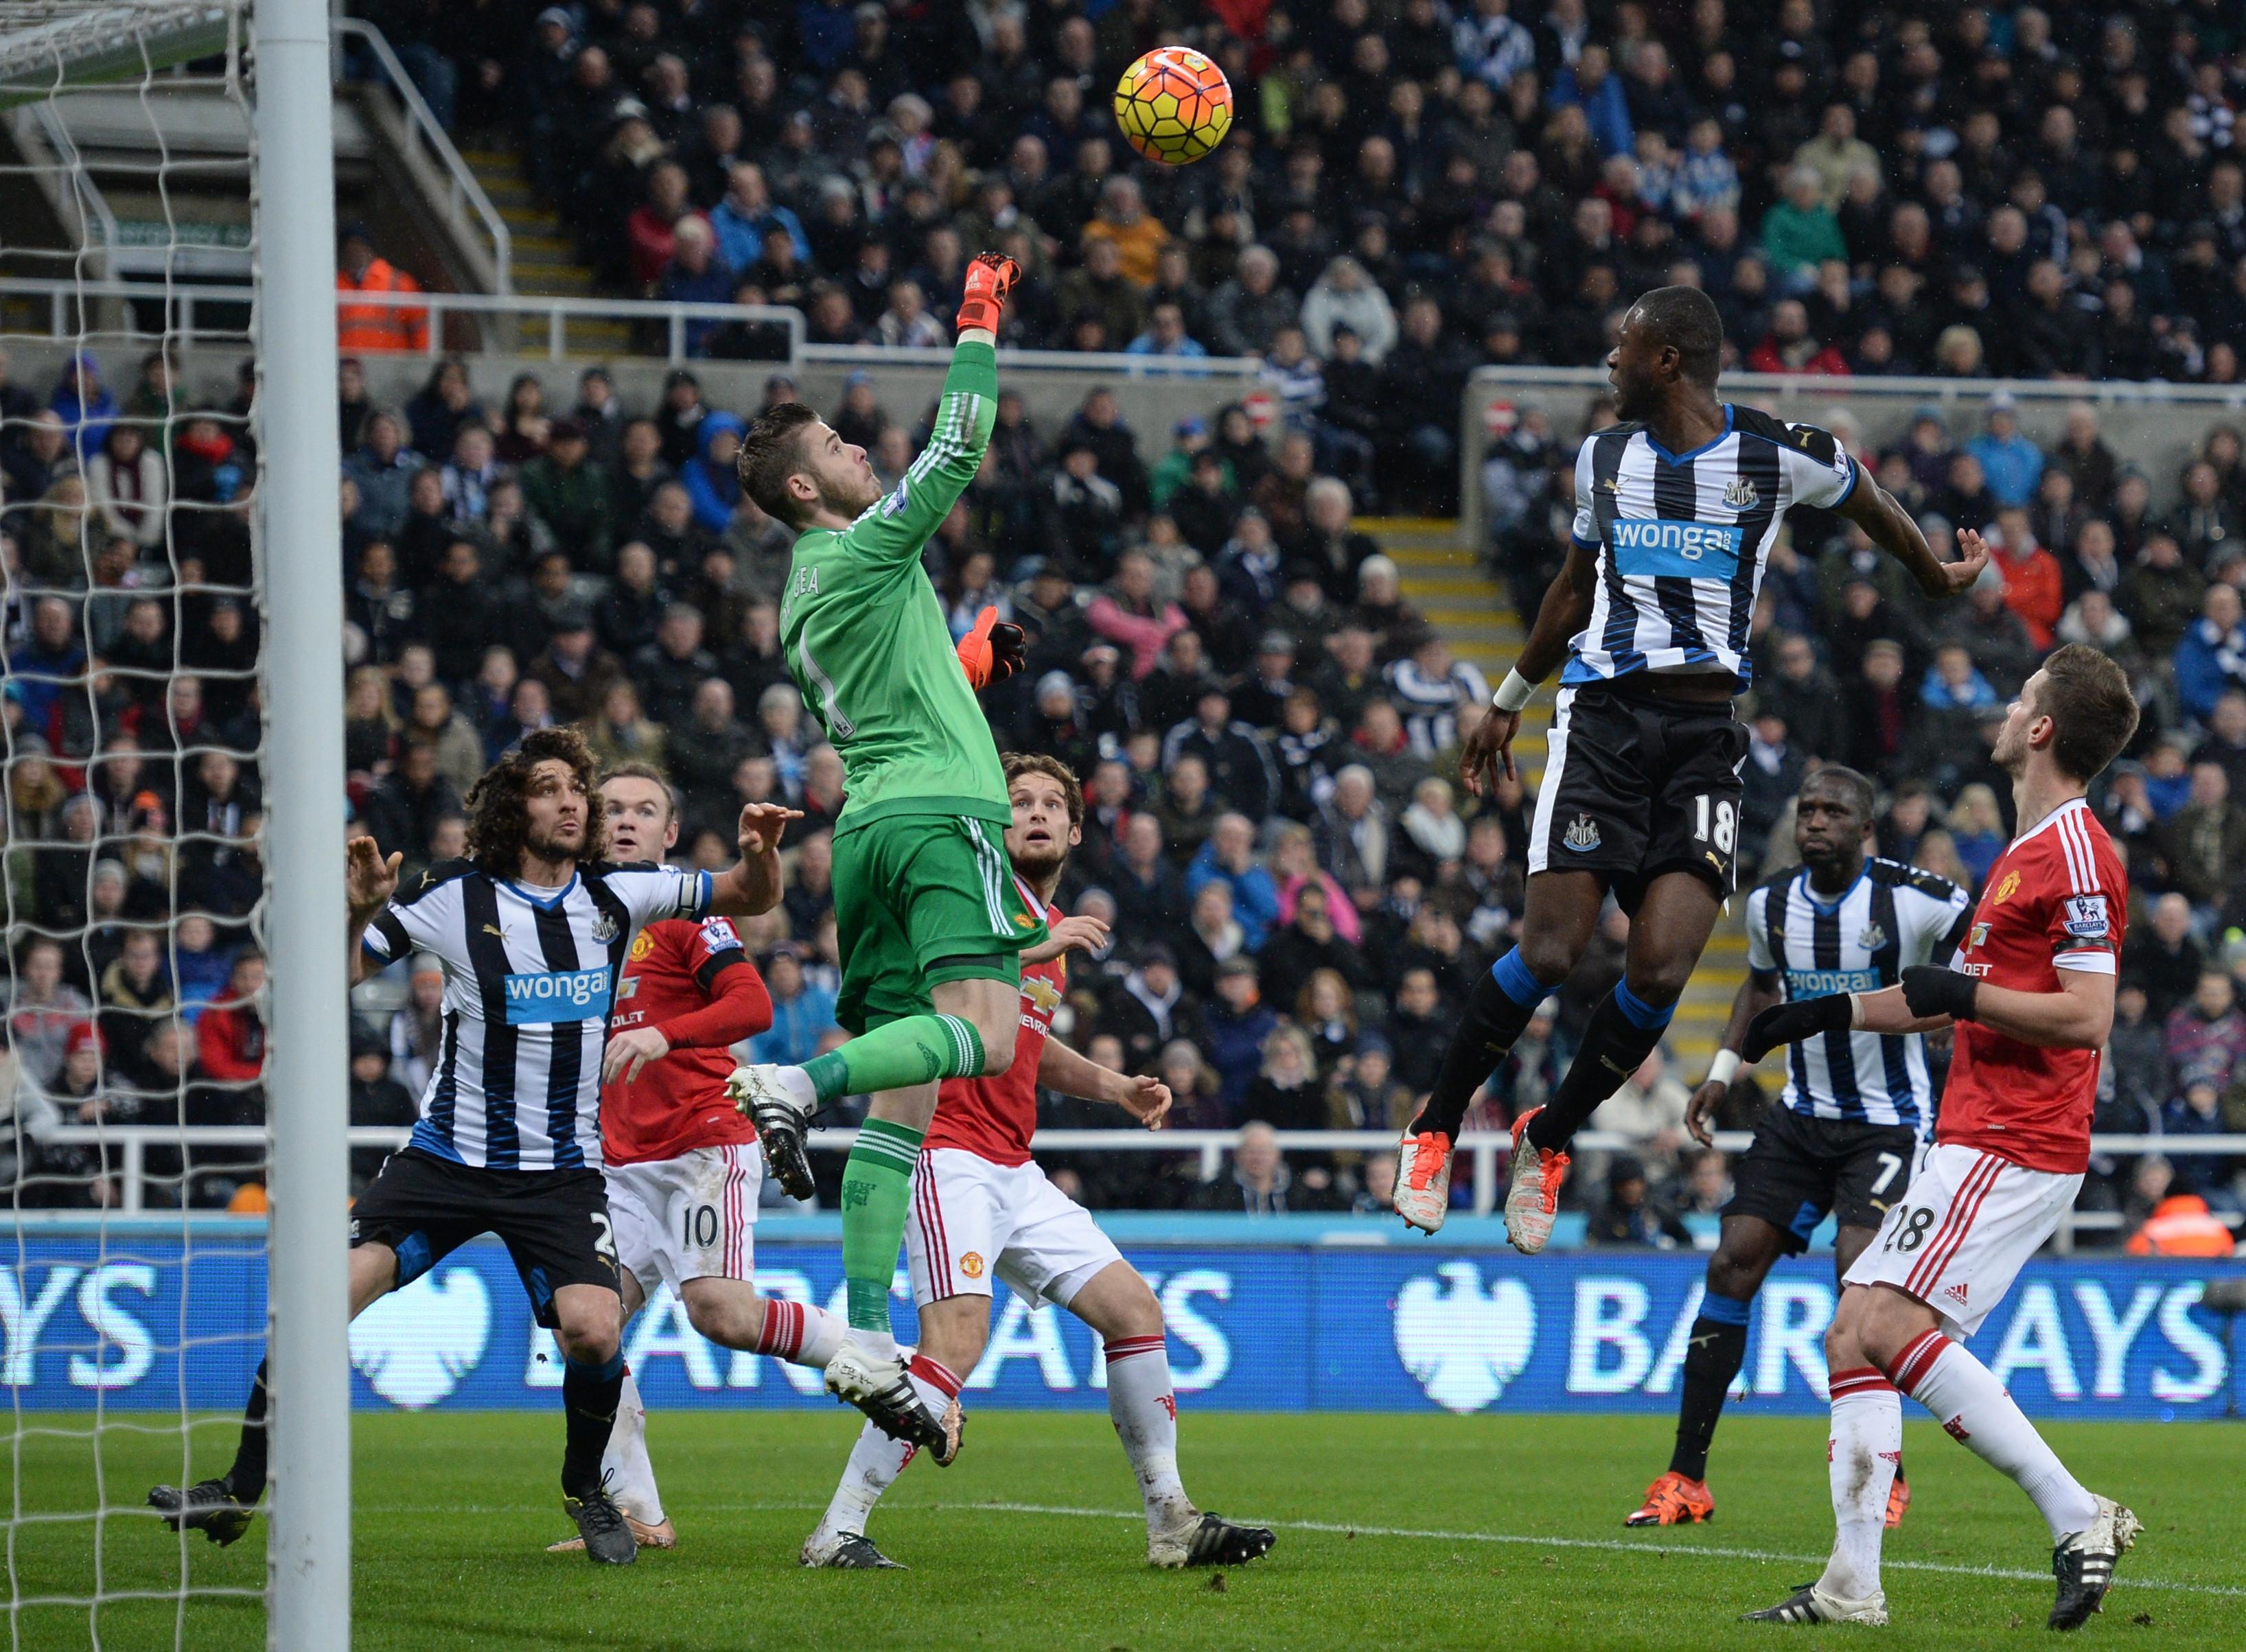 Newcastle United gegen Manchester United